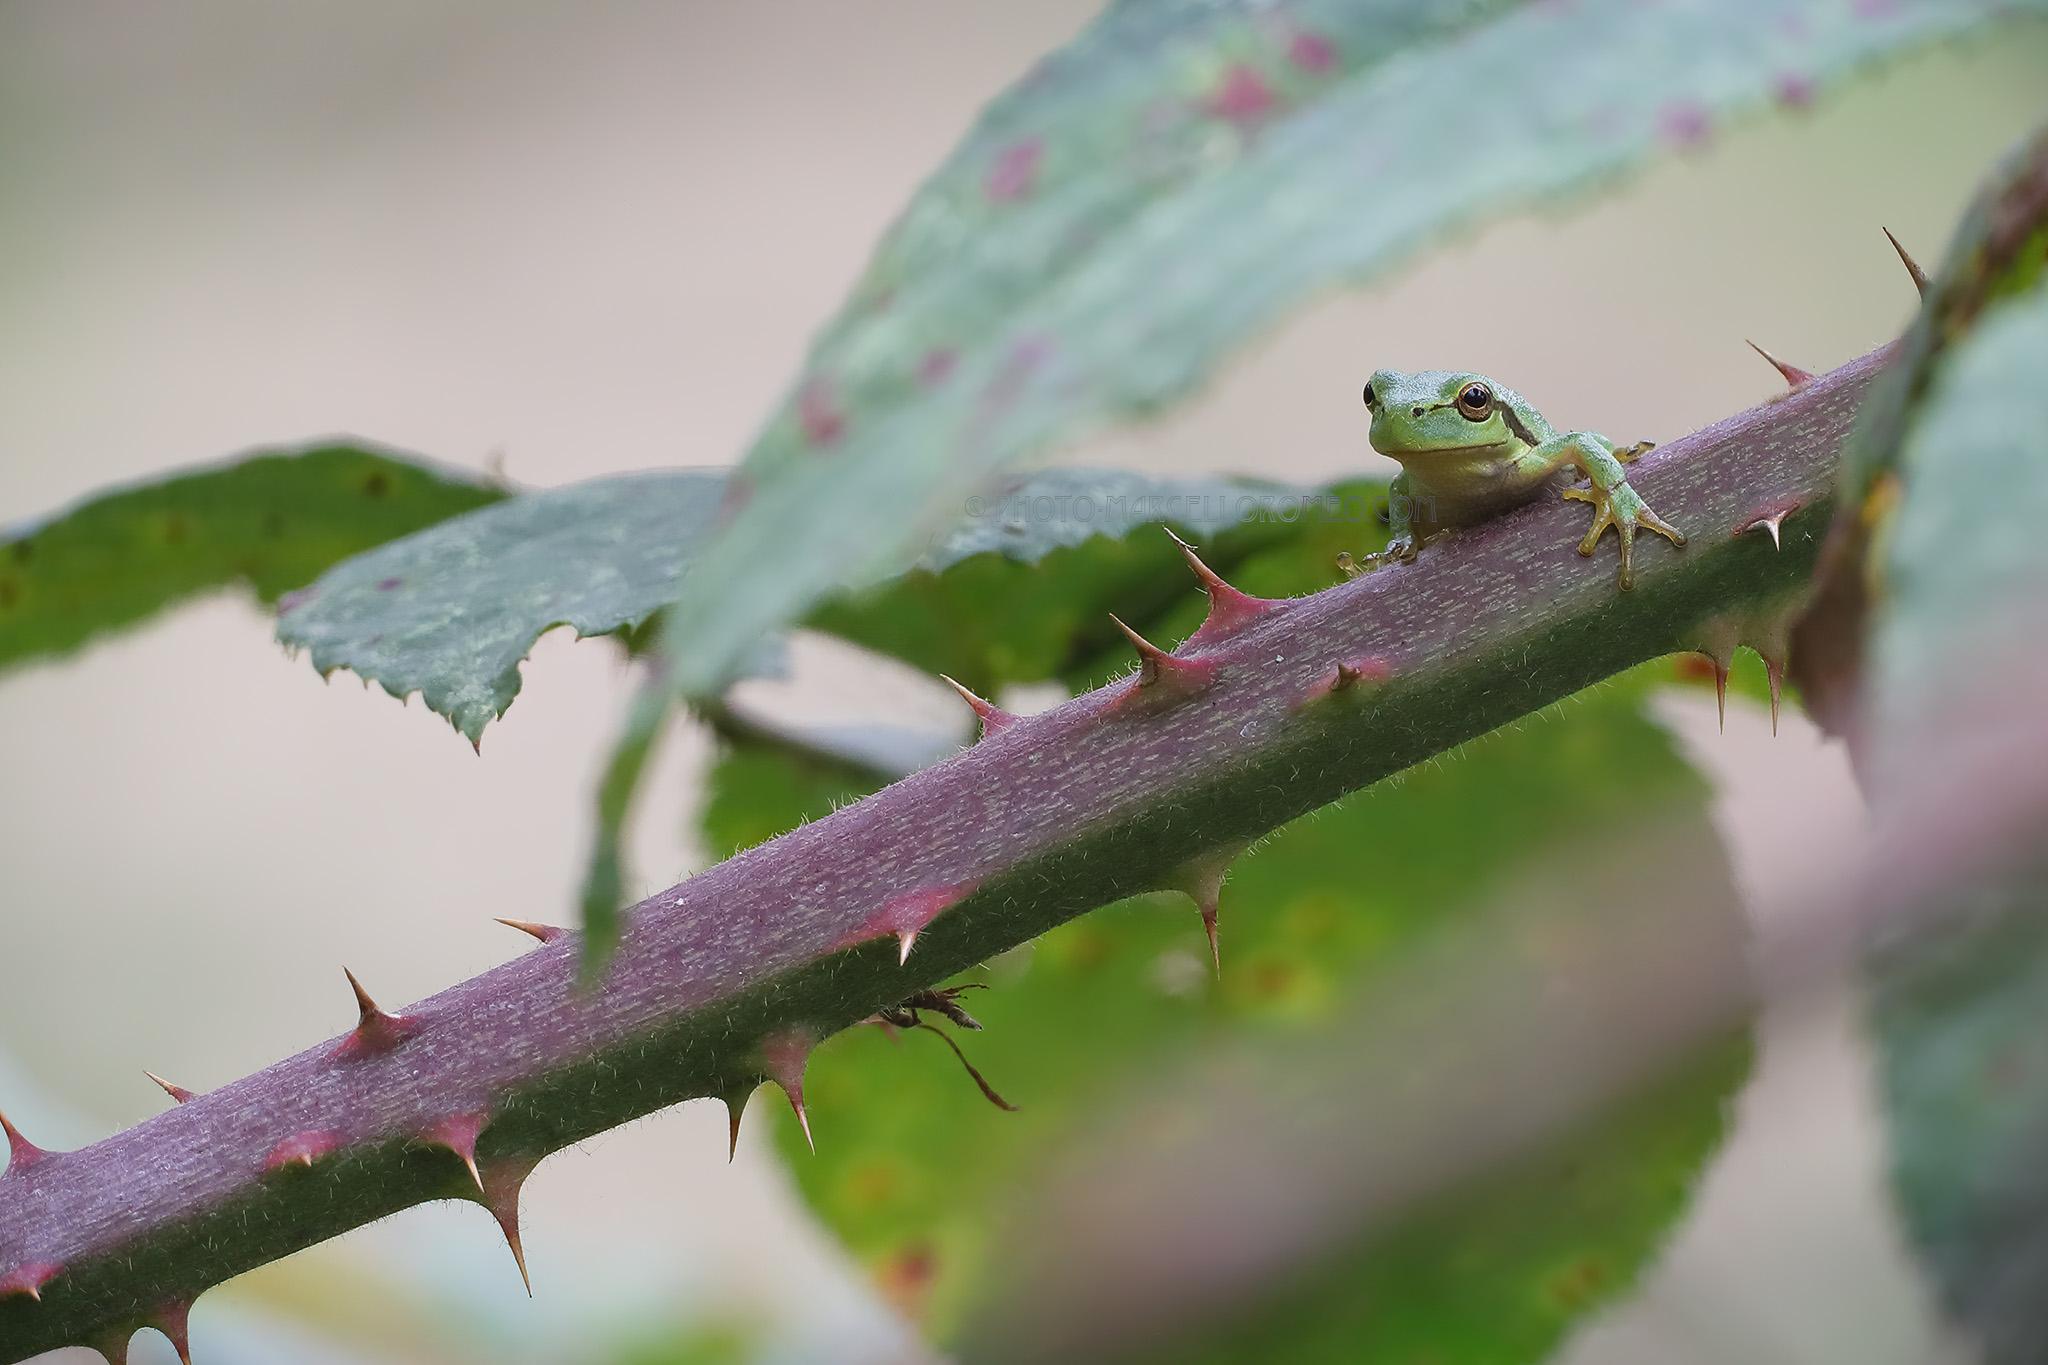 Boomkikker; European Tree Frog; Hyla Arborea